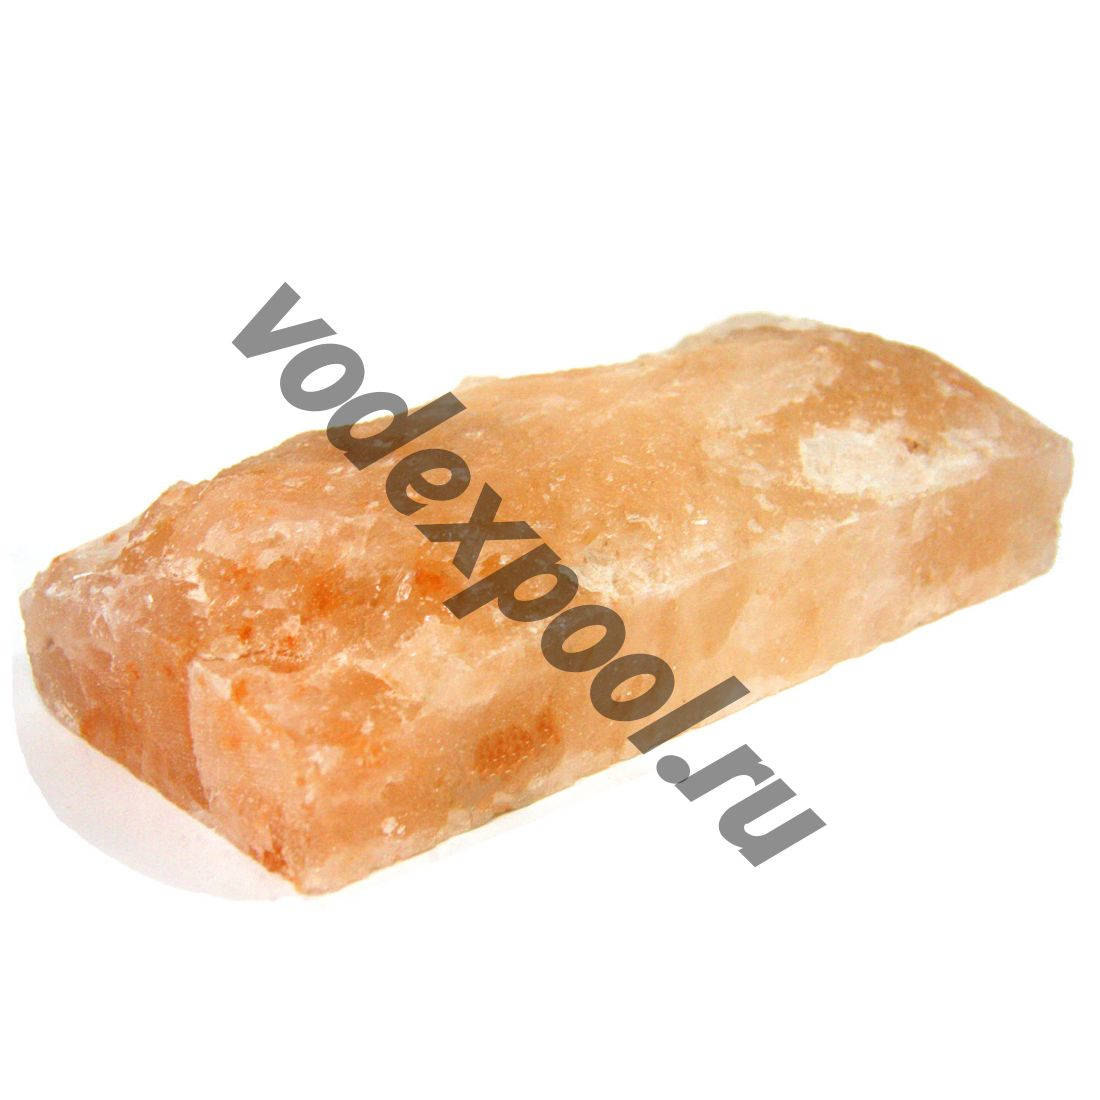 Кирпич соляной 200мм*100мм*50мм сторона натуральная